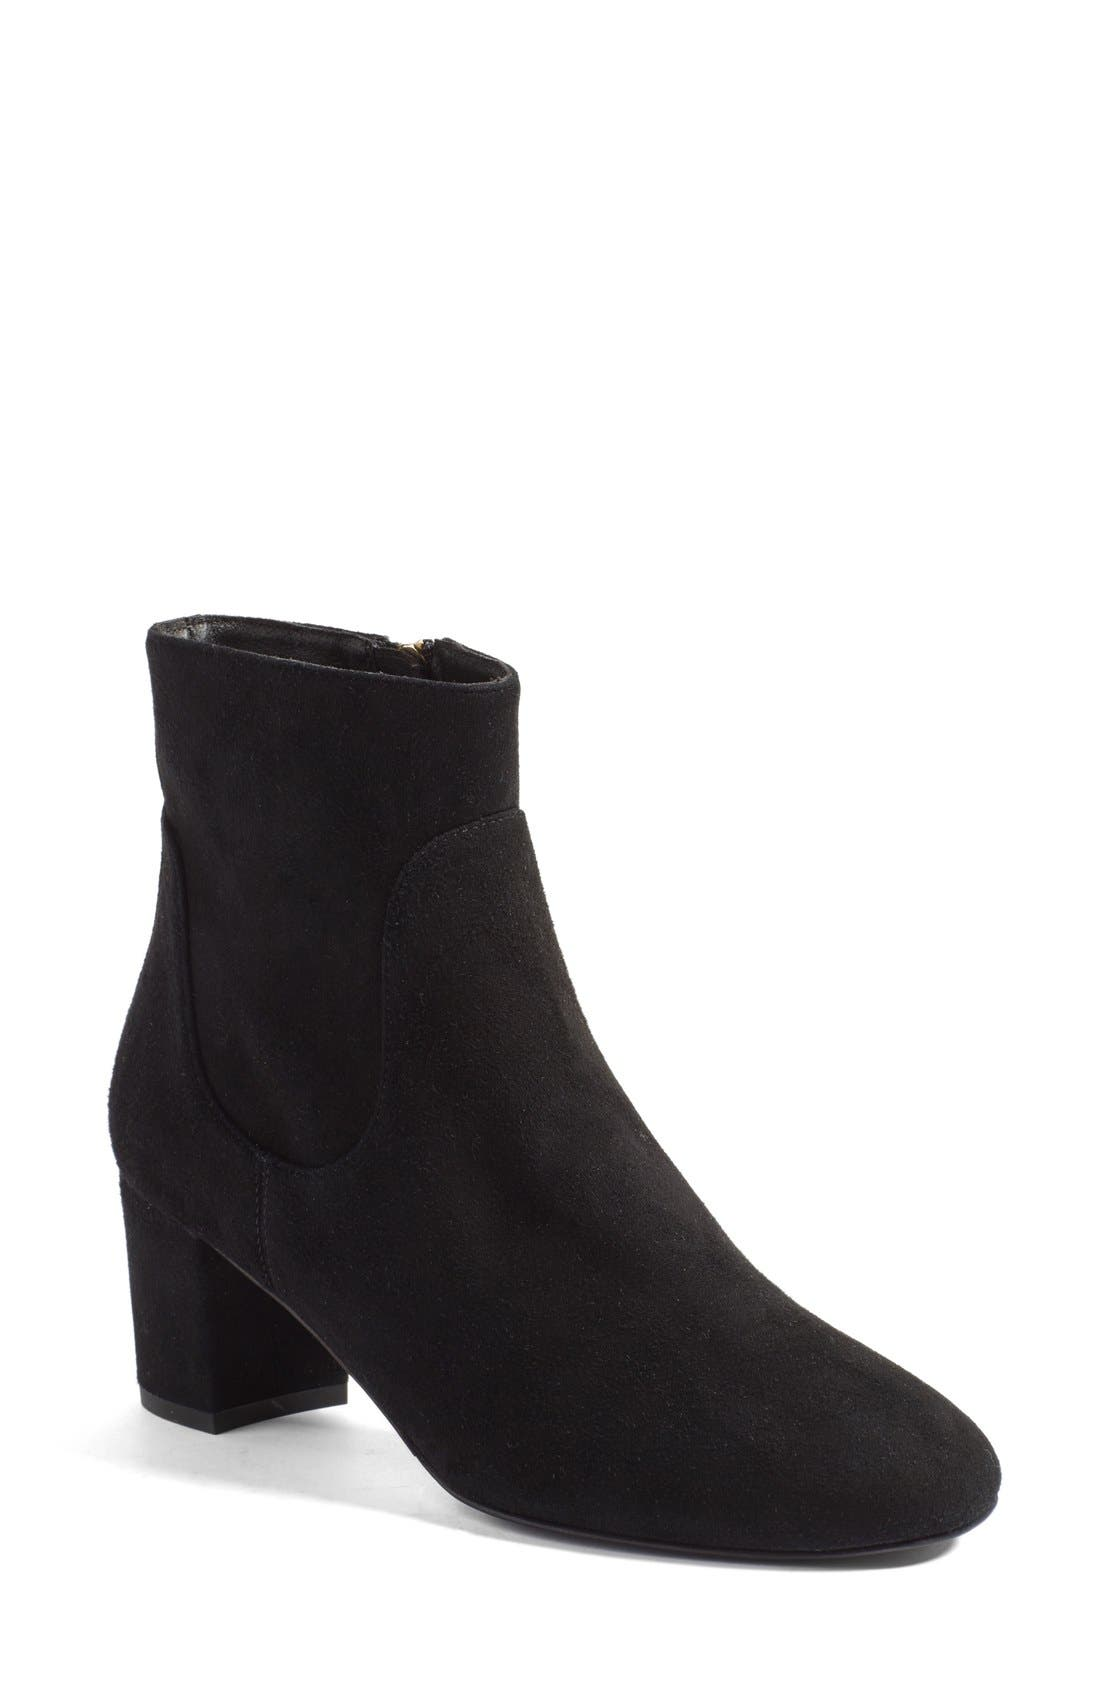 'Simi' Block Heel Bootie,                         Main,                         color, 002